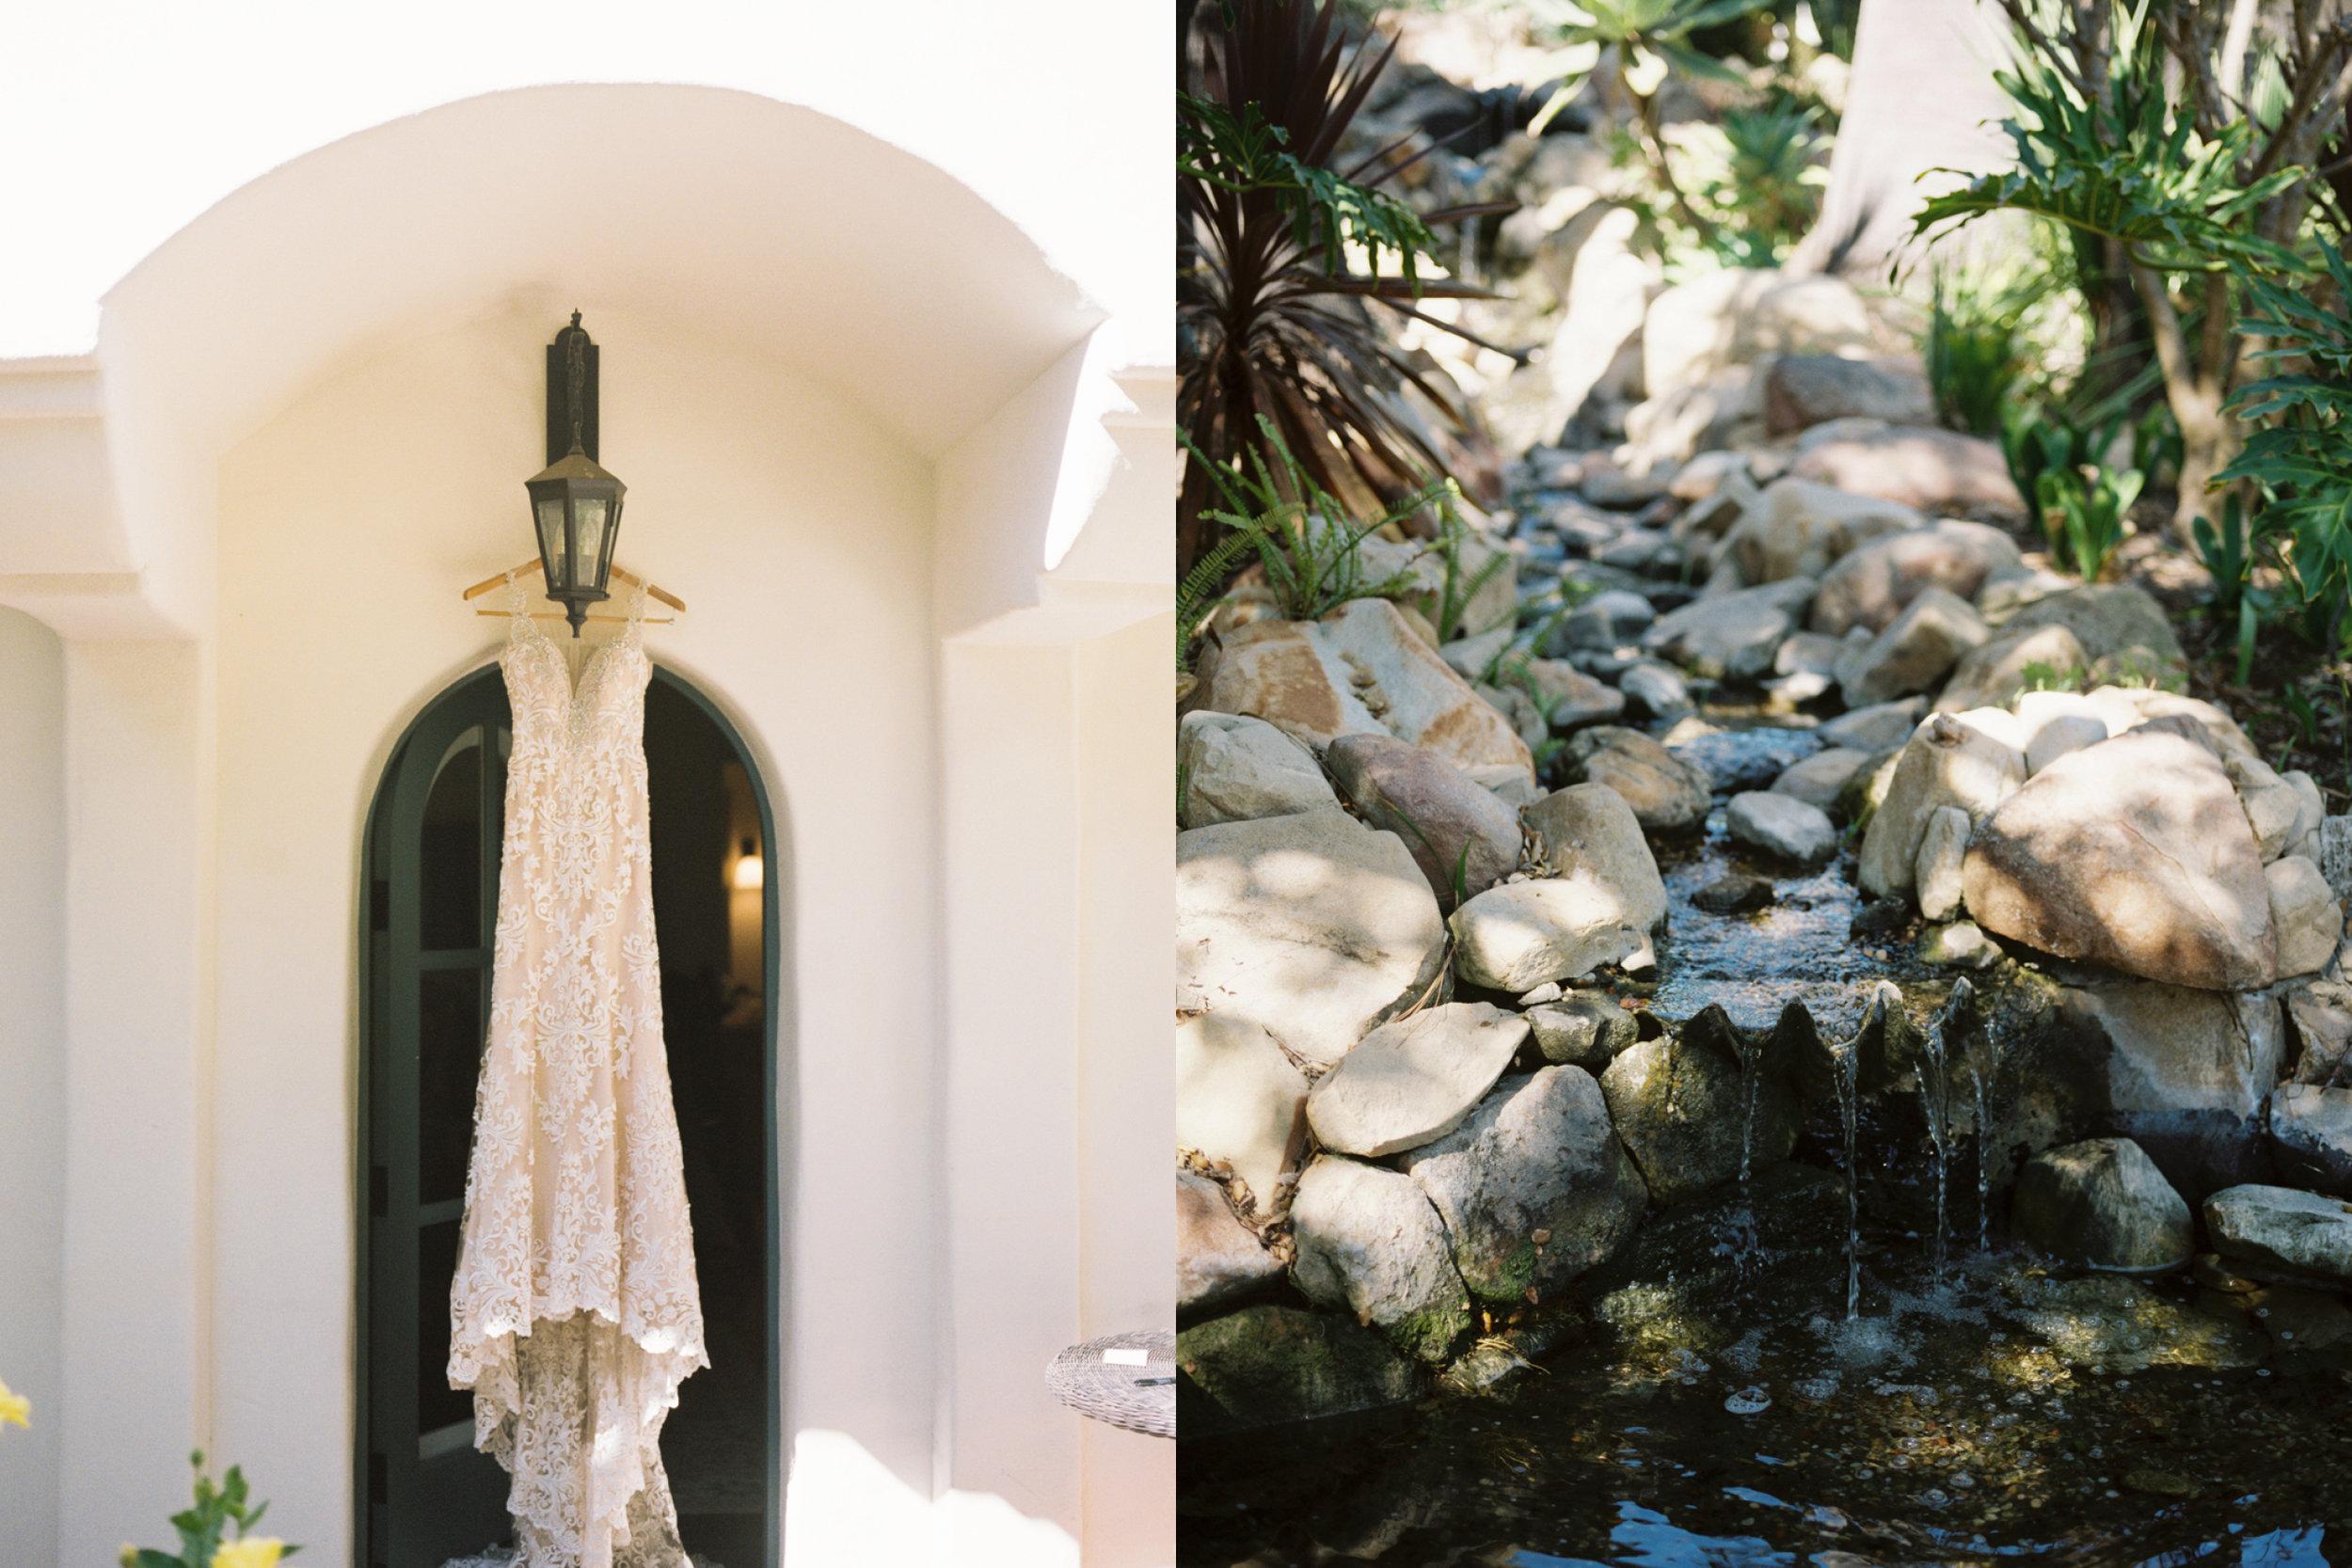 santa-barbara-elopement-elope-alegria-design-event-planner-coordinator-day-of-el-encanto-resort-lily-pond-wedding-intimate-red-maroon-city-ocean-view-rooftop (2).jpg